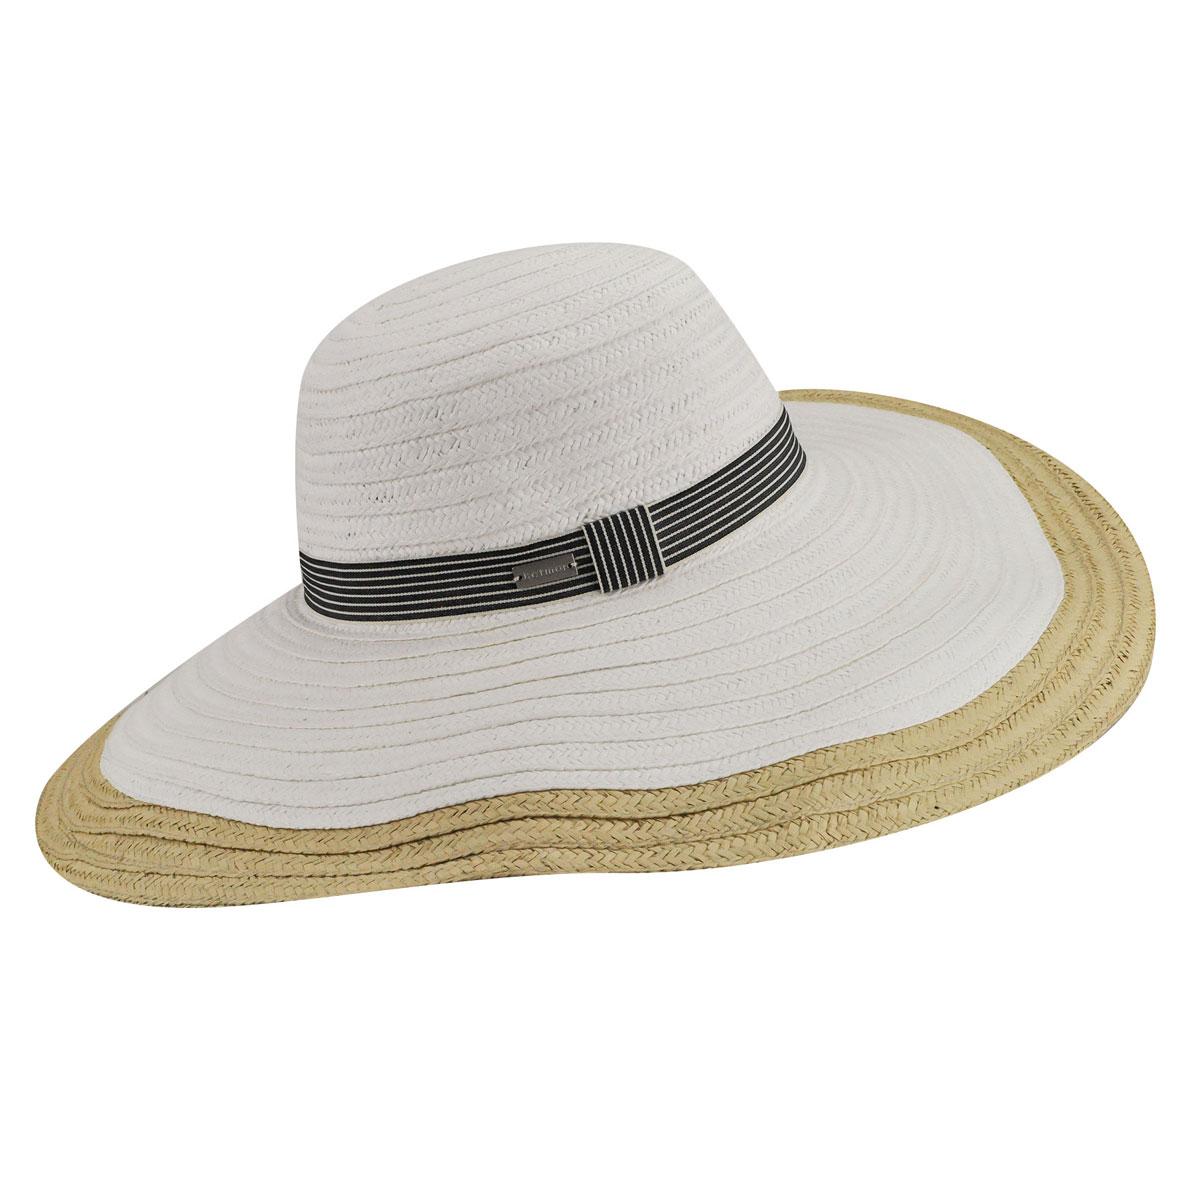 Betmar Lora Braided Floppy Wide Brim Hat in White,Natural